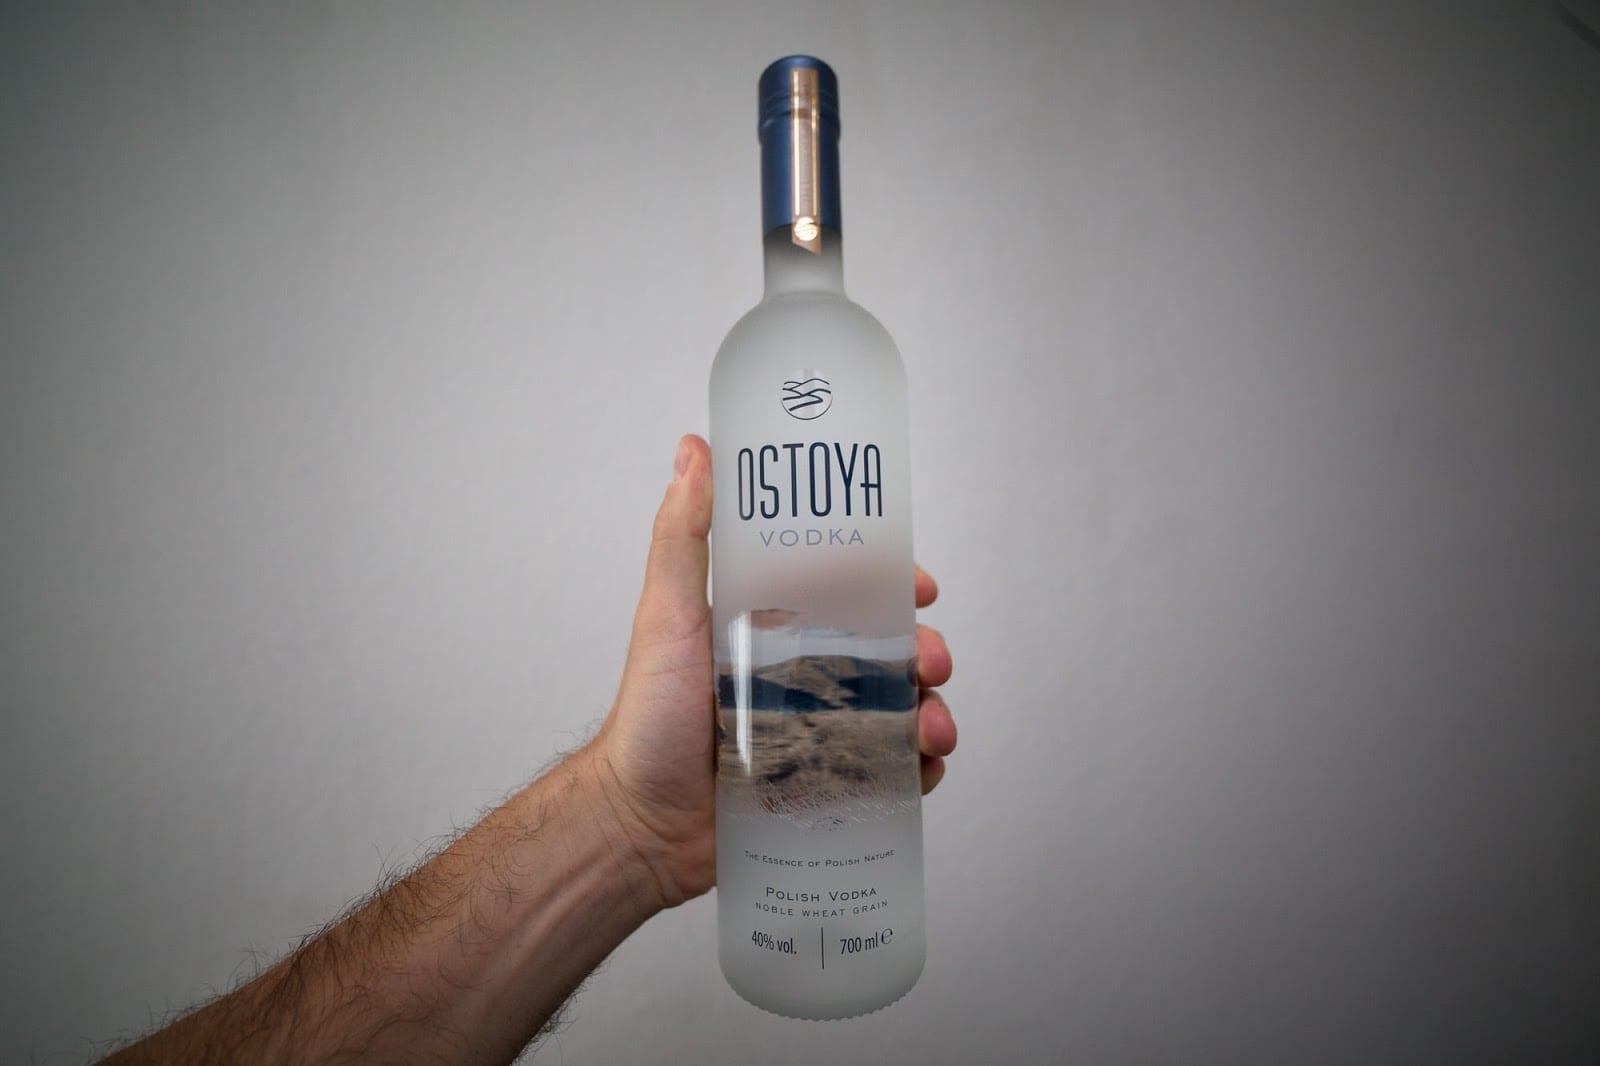 vodka ba lan, rượu vodka ba lan, giá rượu vodka ba lan, vodka cỏ ba lan, rượu vodka cỏ ba lan